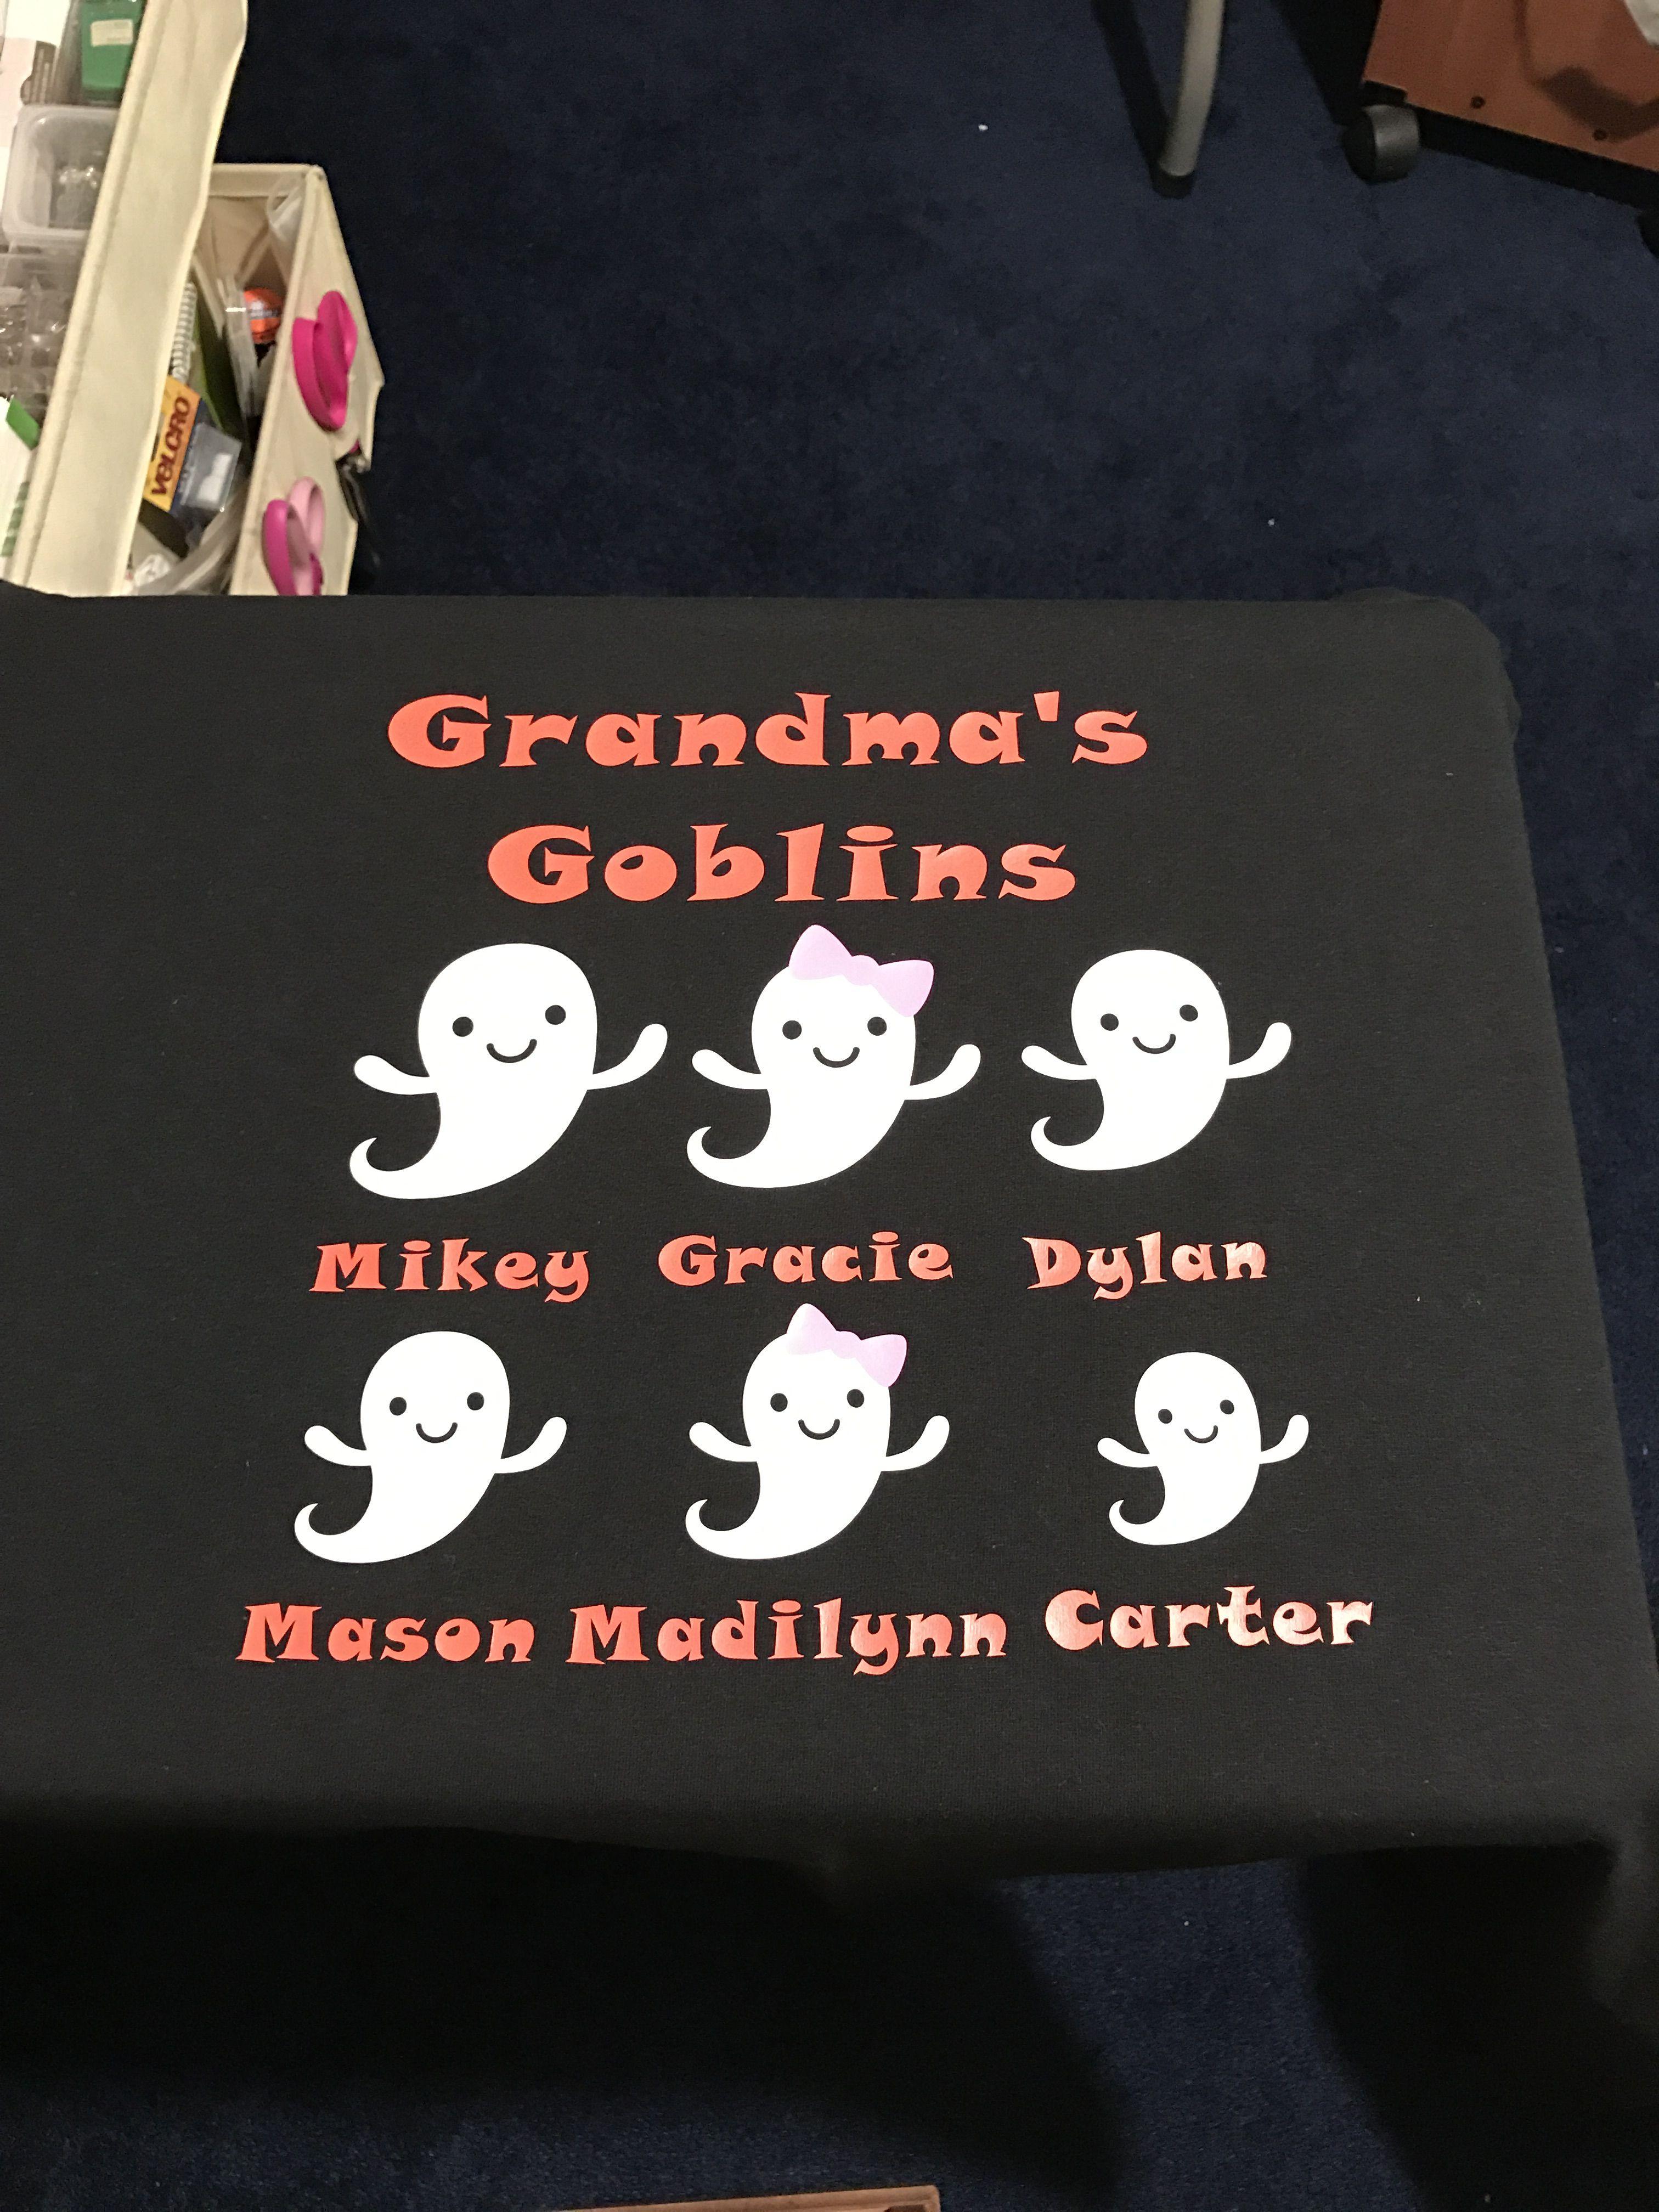 My new Halloween t-shirt